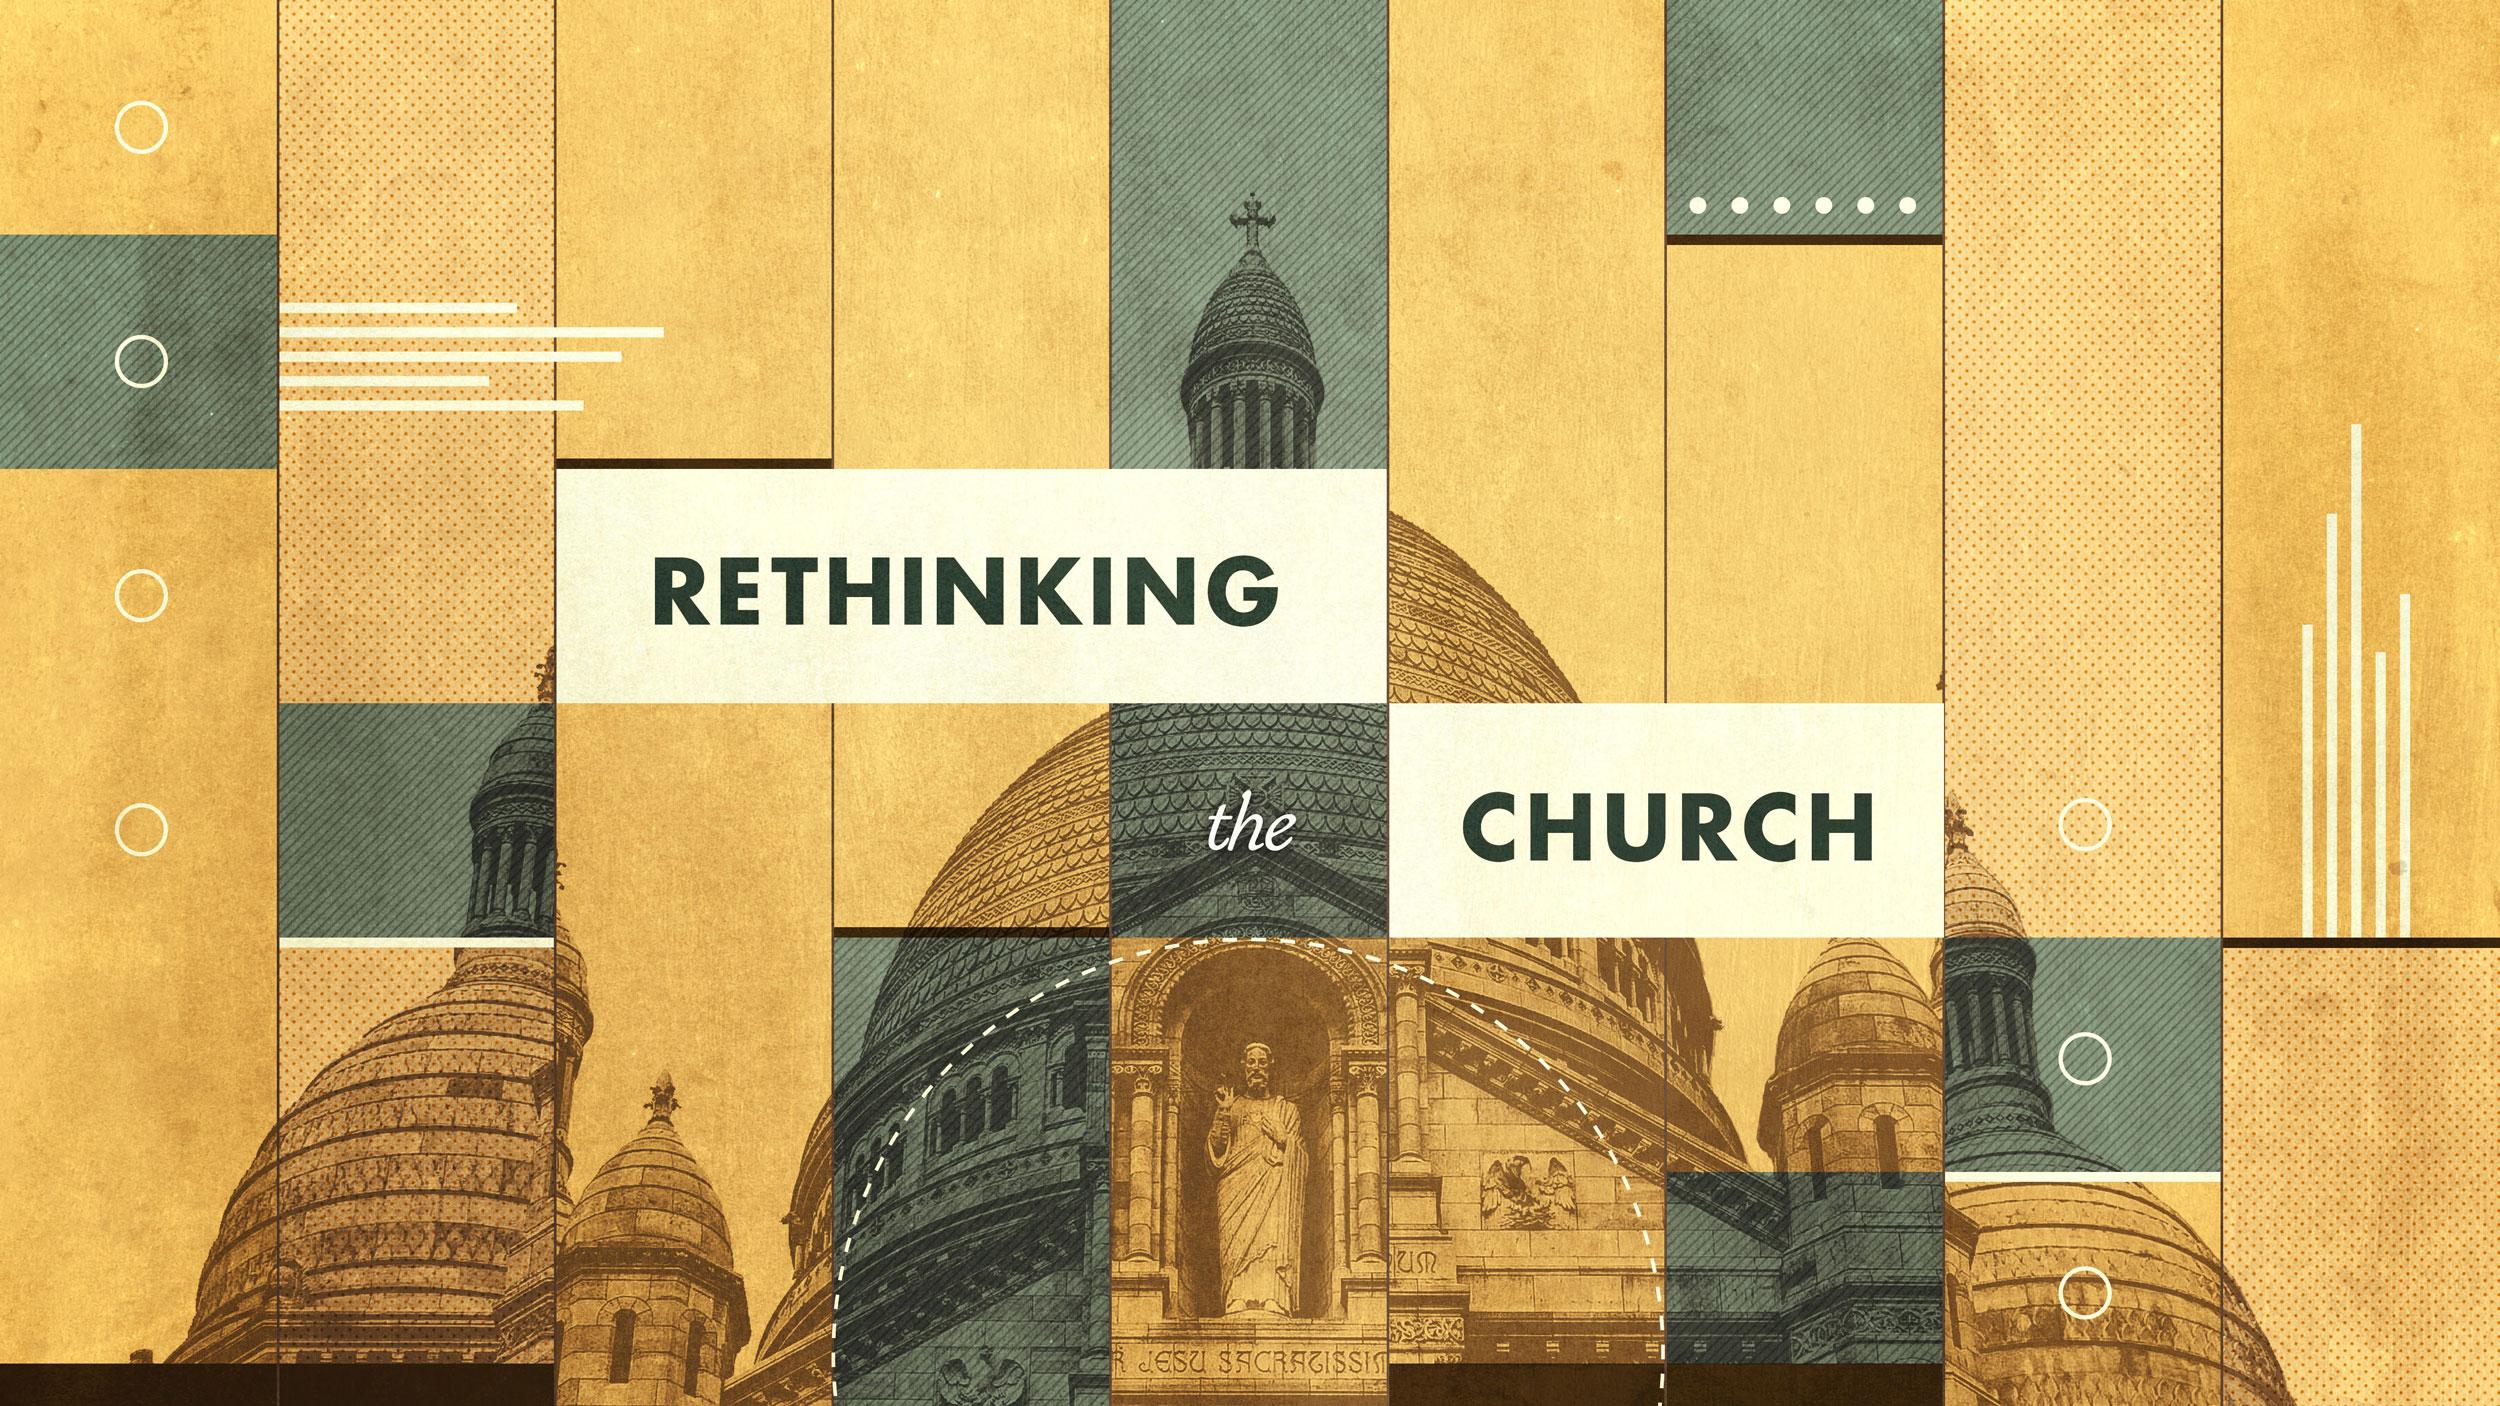 Rethinking-the-Church_Jim-LePage.jpg